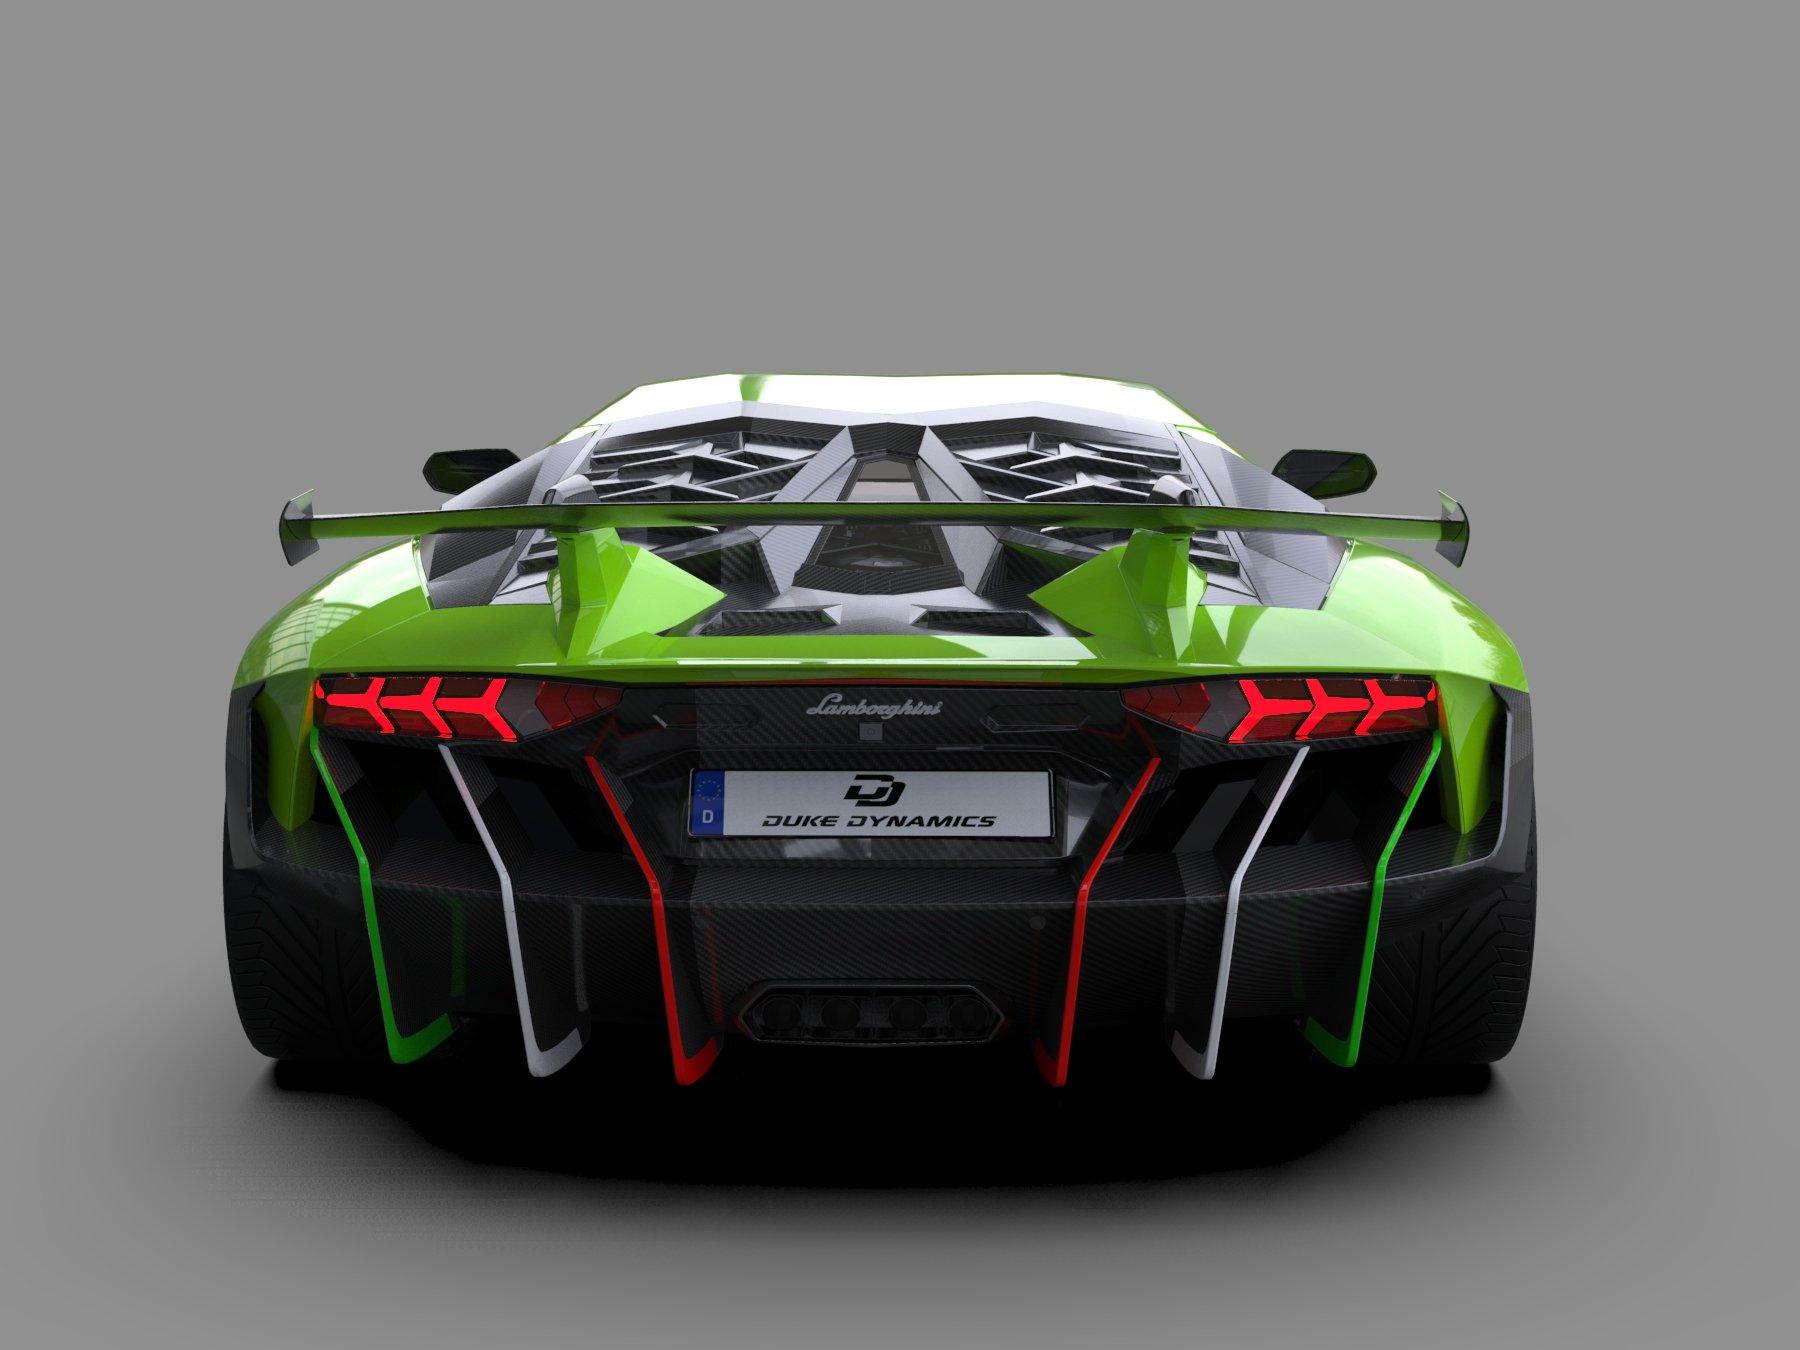 Lamborghini_Aventador_by_Duke_Dynamics_0025